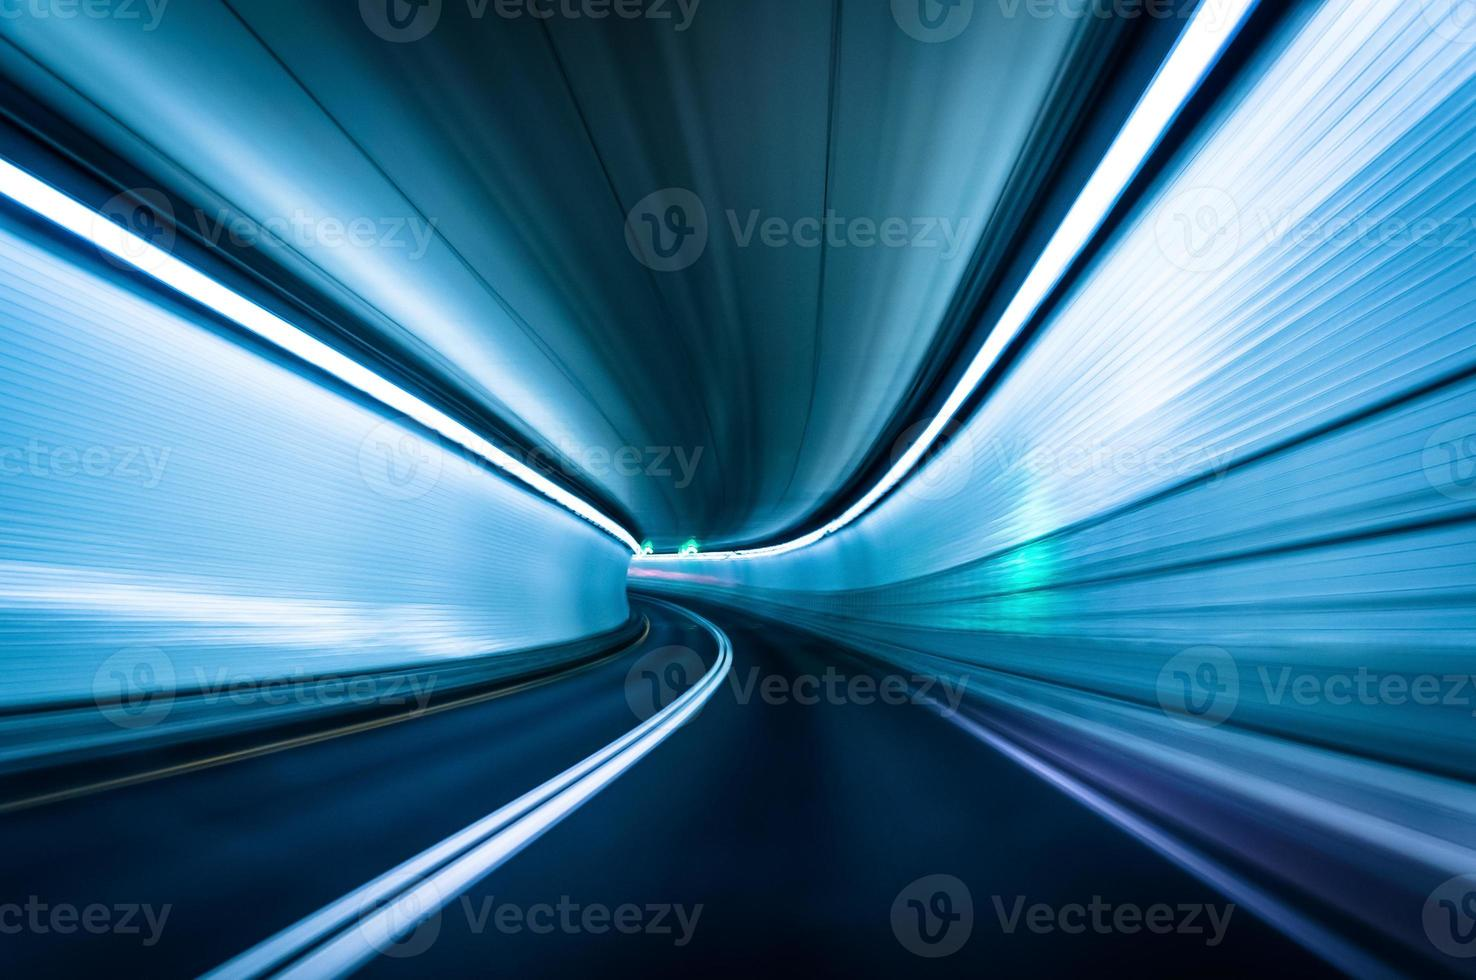 lange blootstelling genomen in de Fort Mchenry-tunnel, Baltimore, Maryl foto